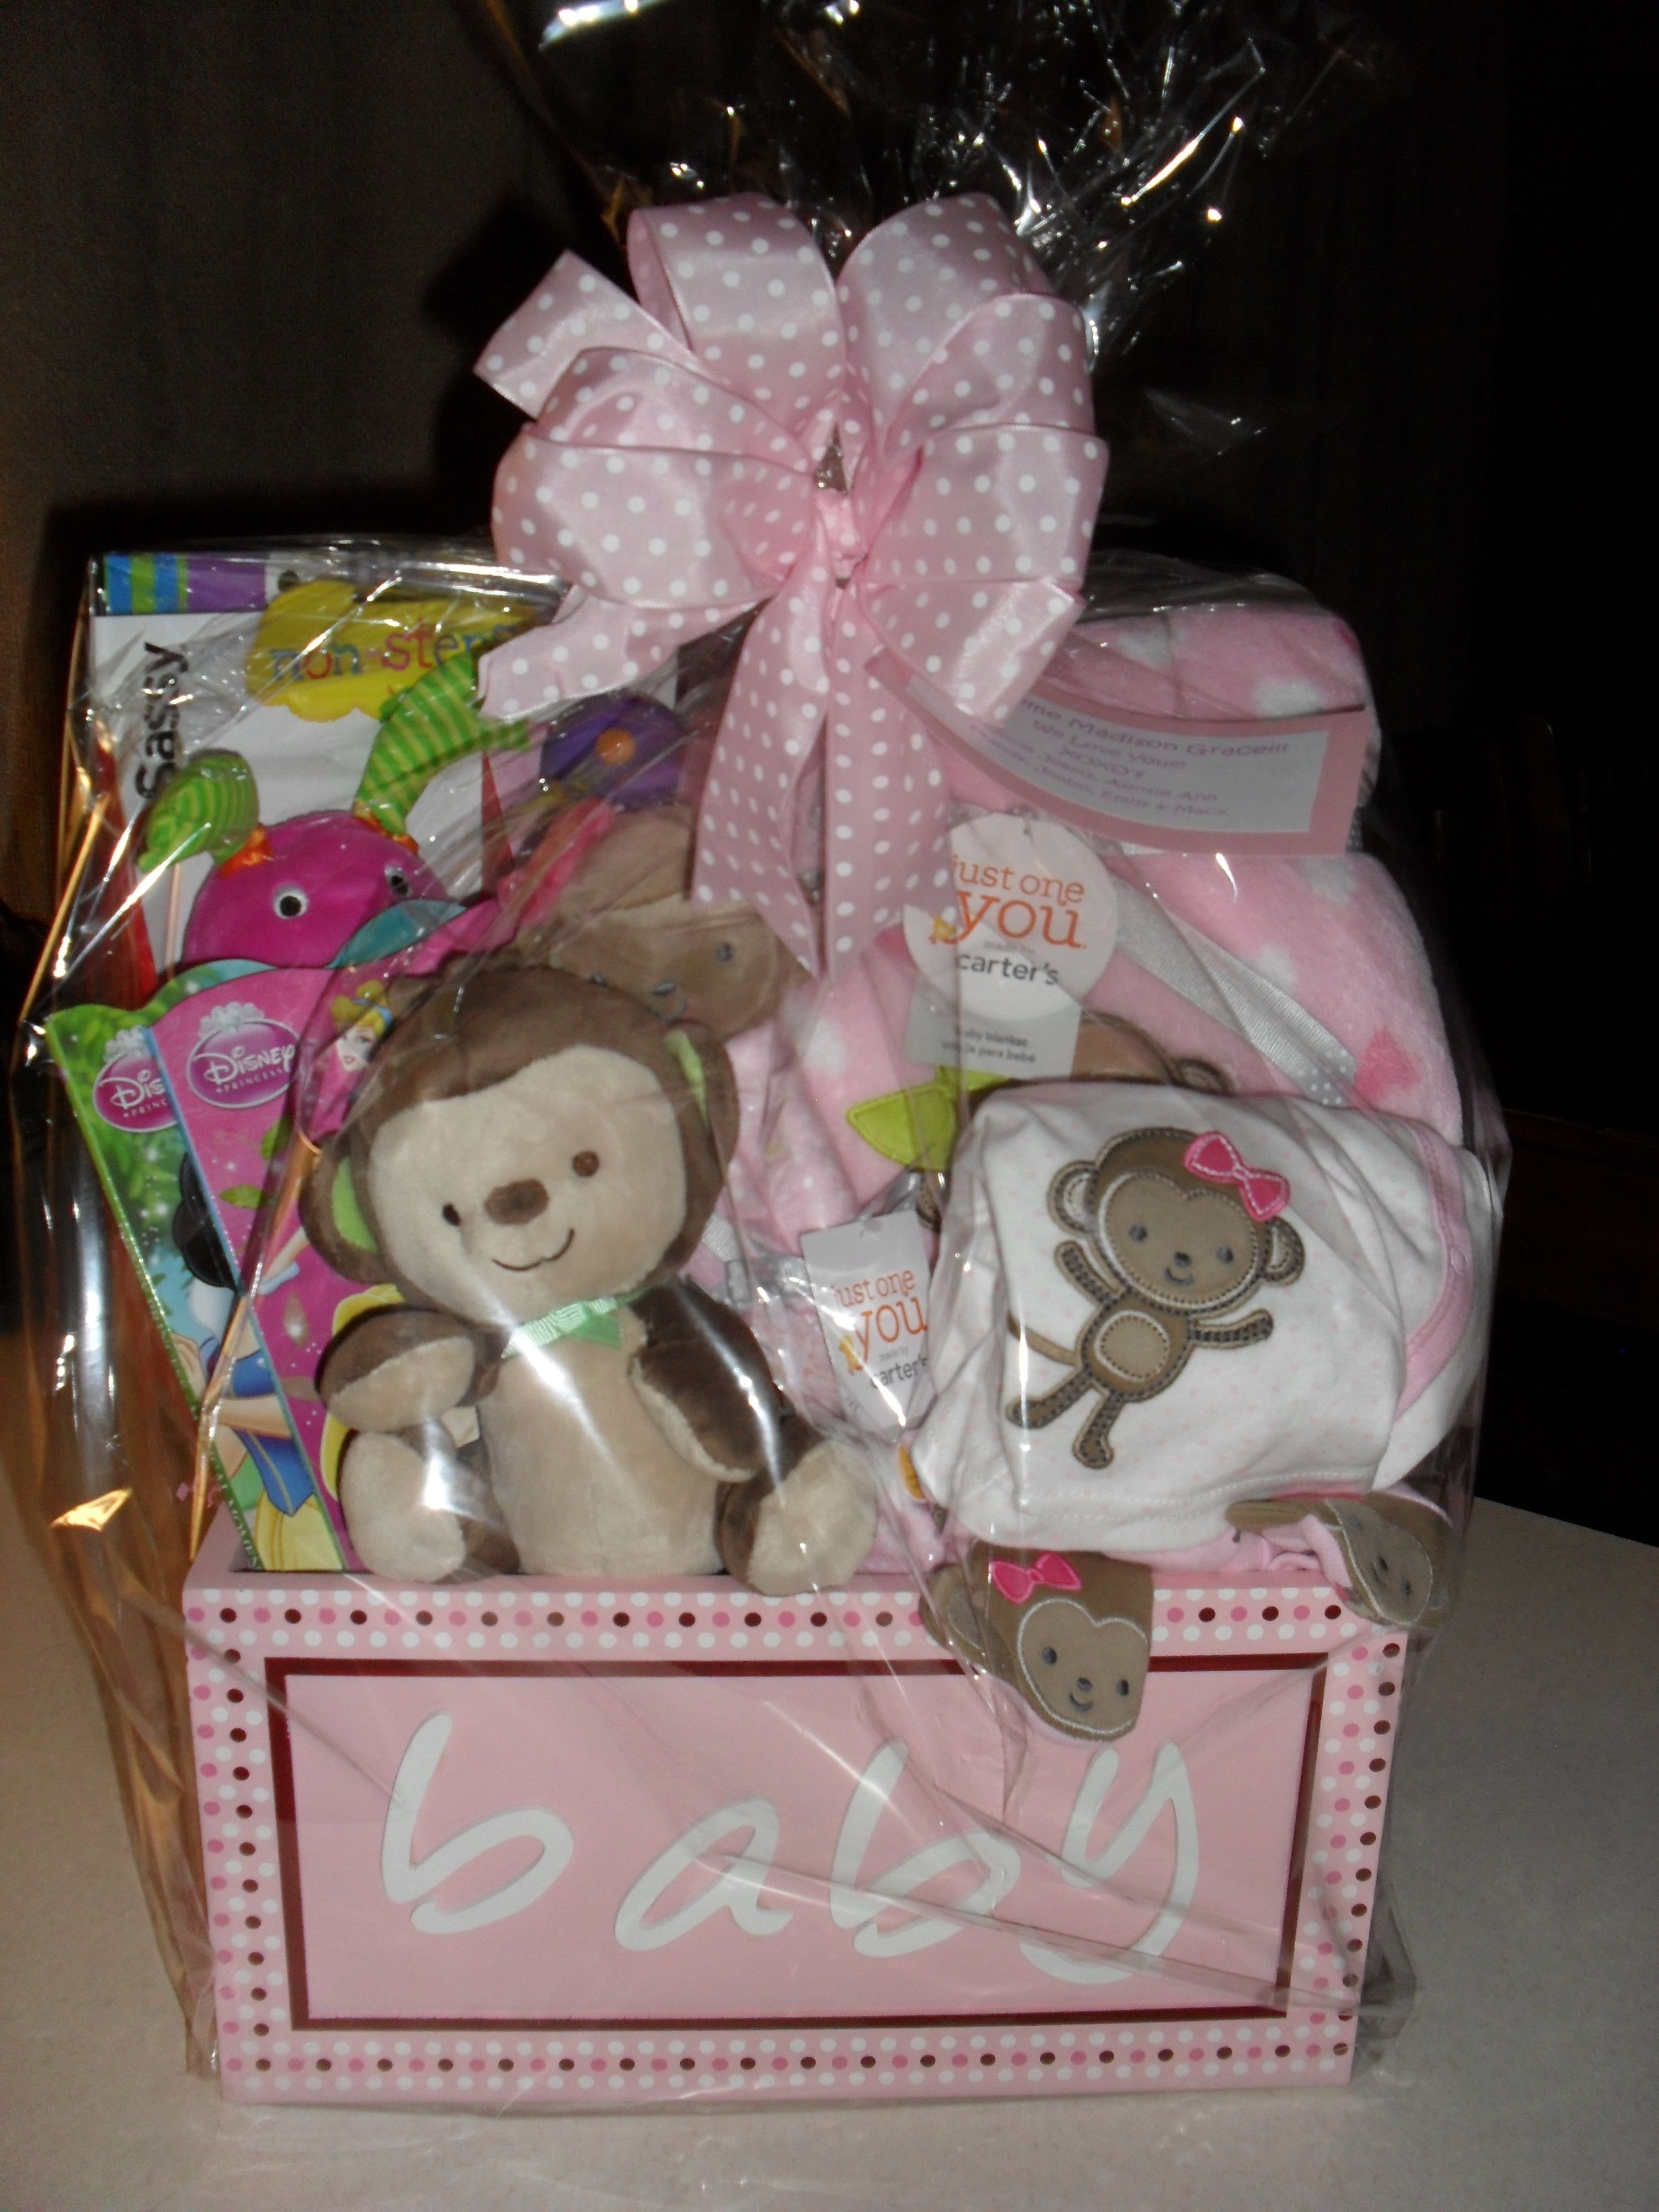 10 Lovable Baby Girl Gift Basket Ideas baby girl gift basket cellophane wrapped gifts gift baskets